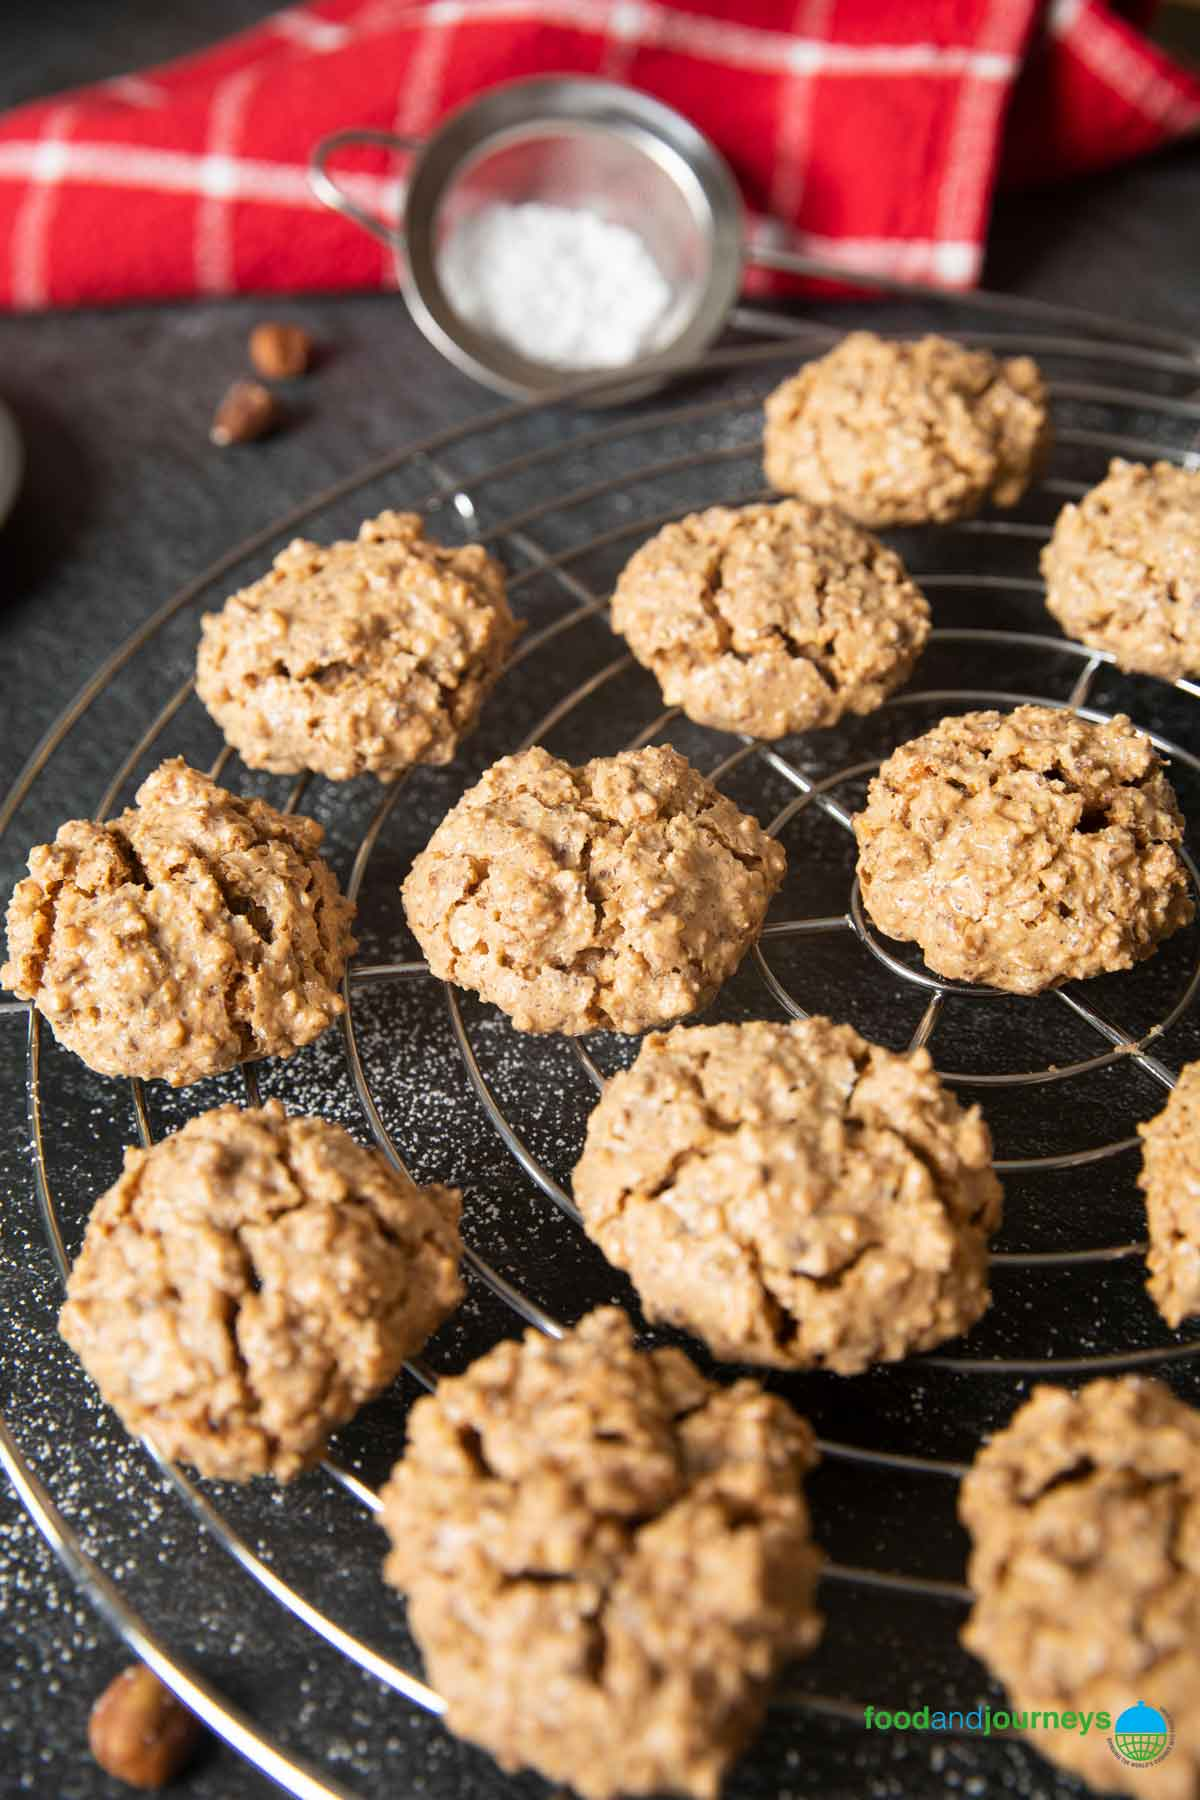 Freshly baked hazelnut meringue cookies on a cooling rack.